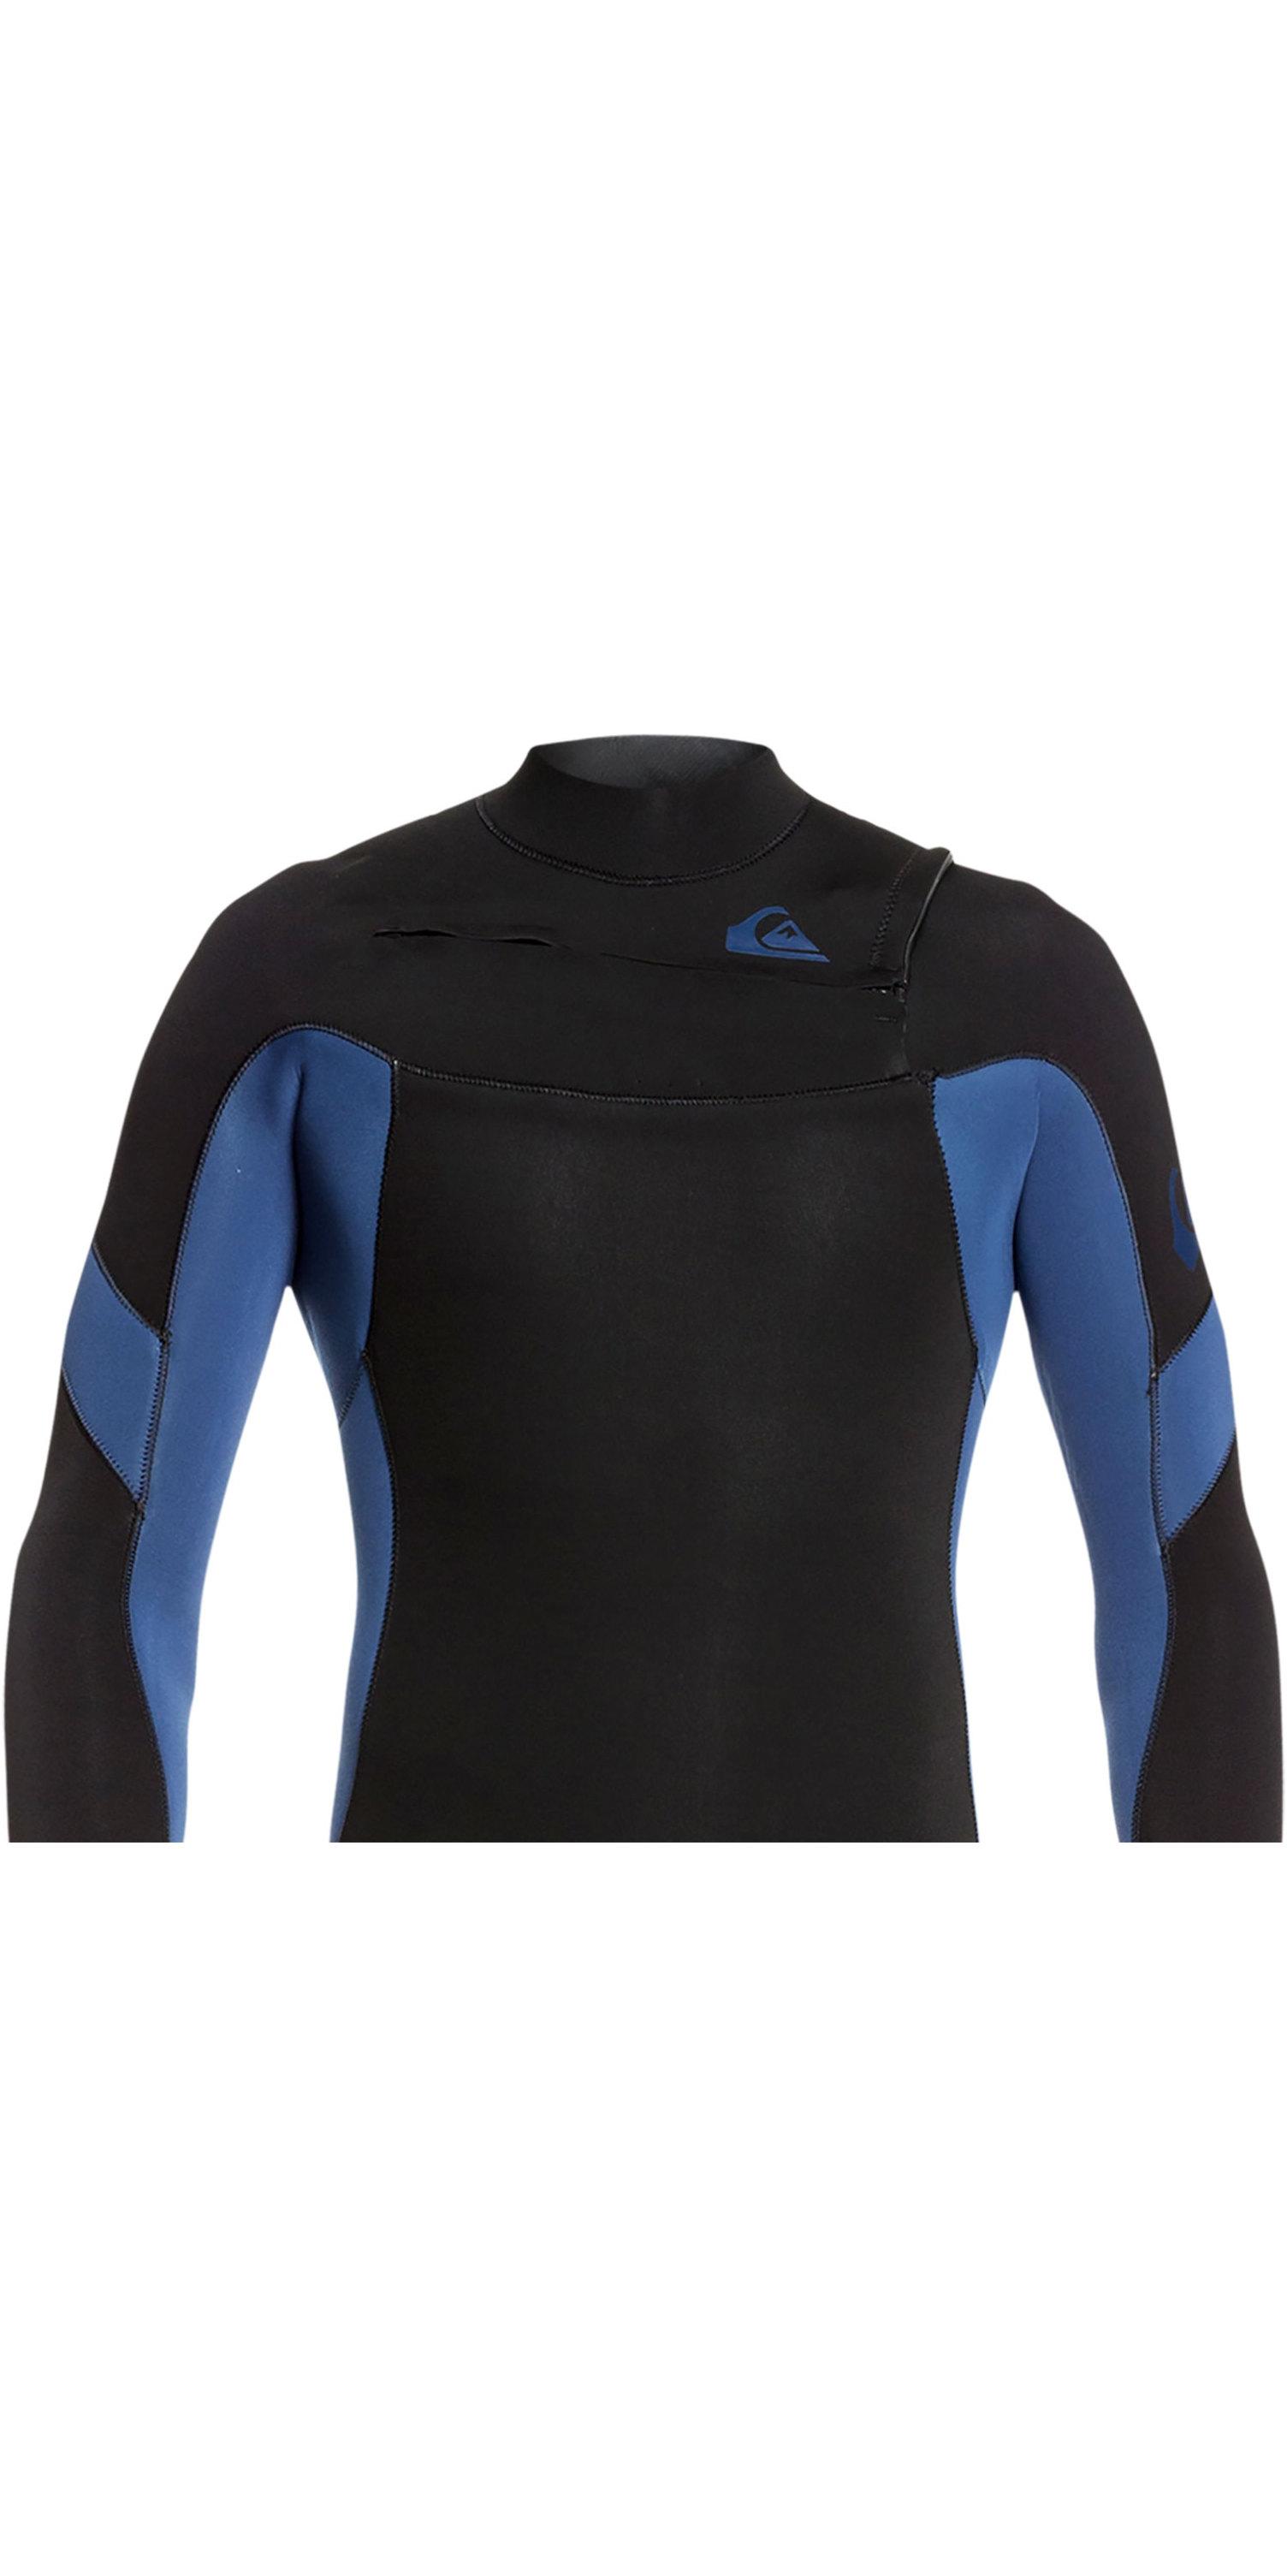 2019 Quiksilver Mens Syncro 4/3mm Chest Zip Wetsuit Black / Iodine Blue EQYW103087